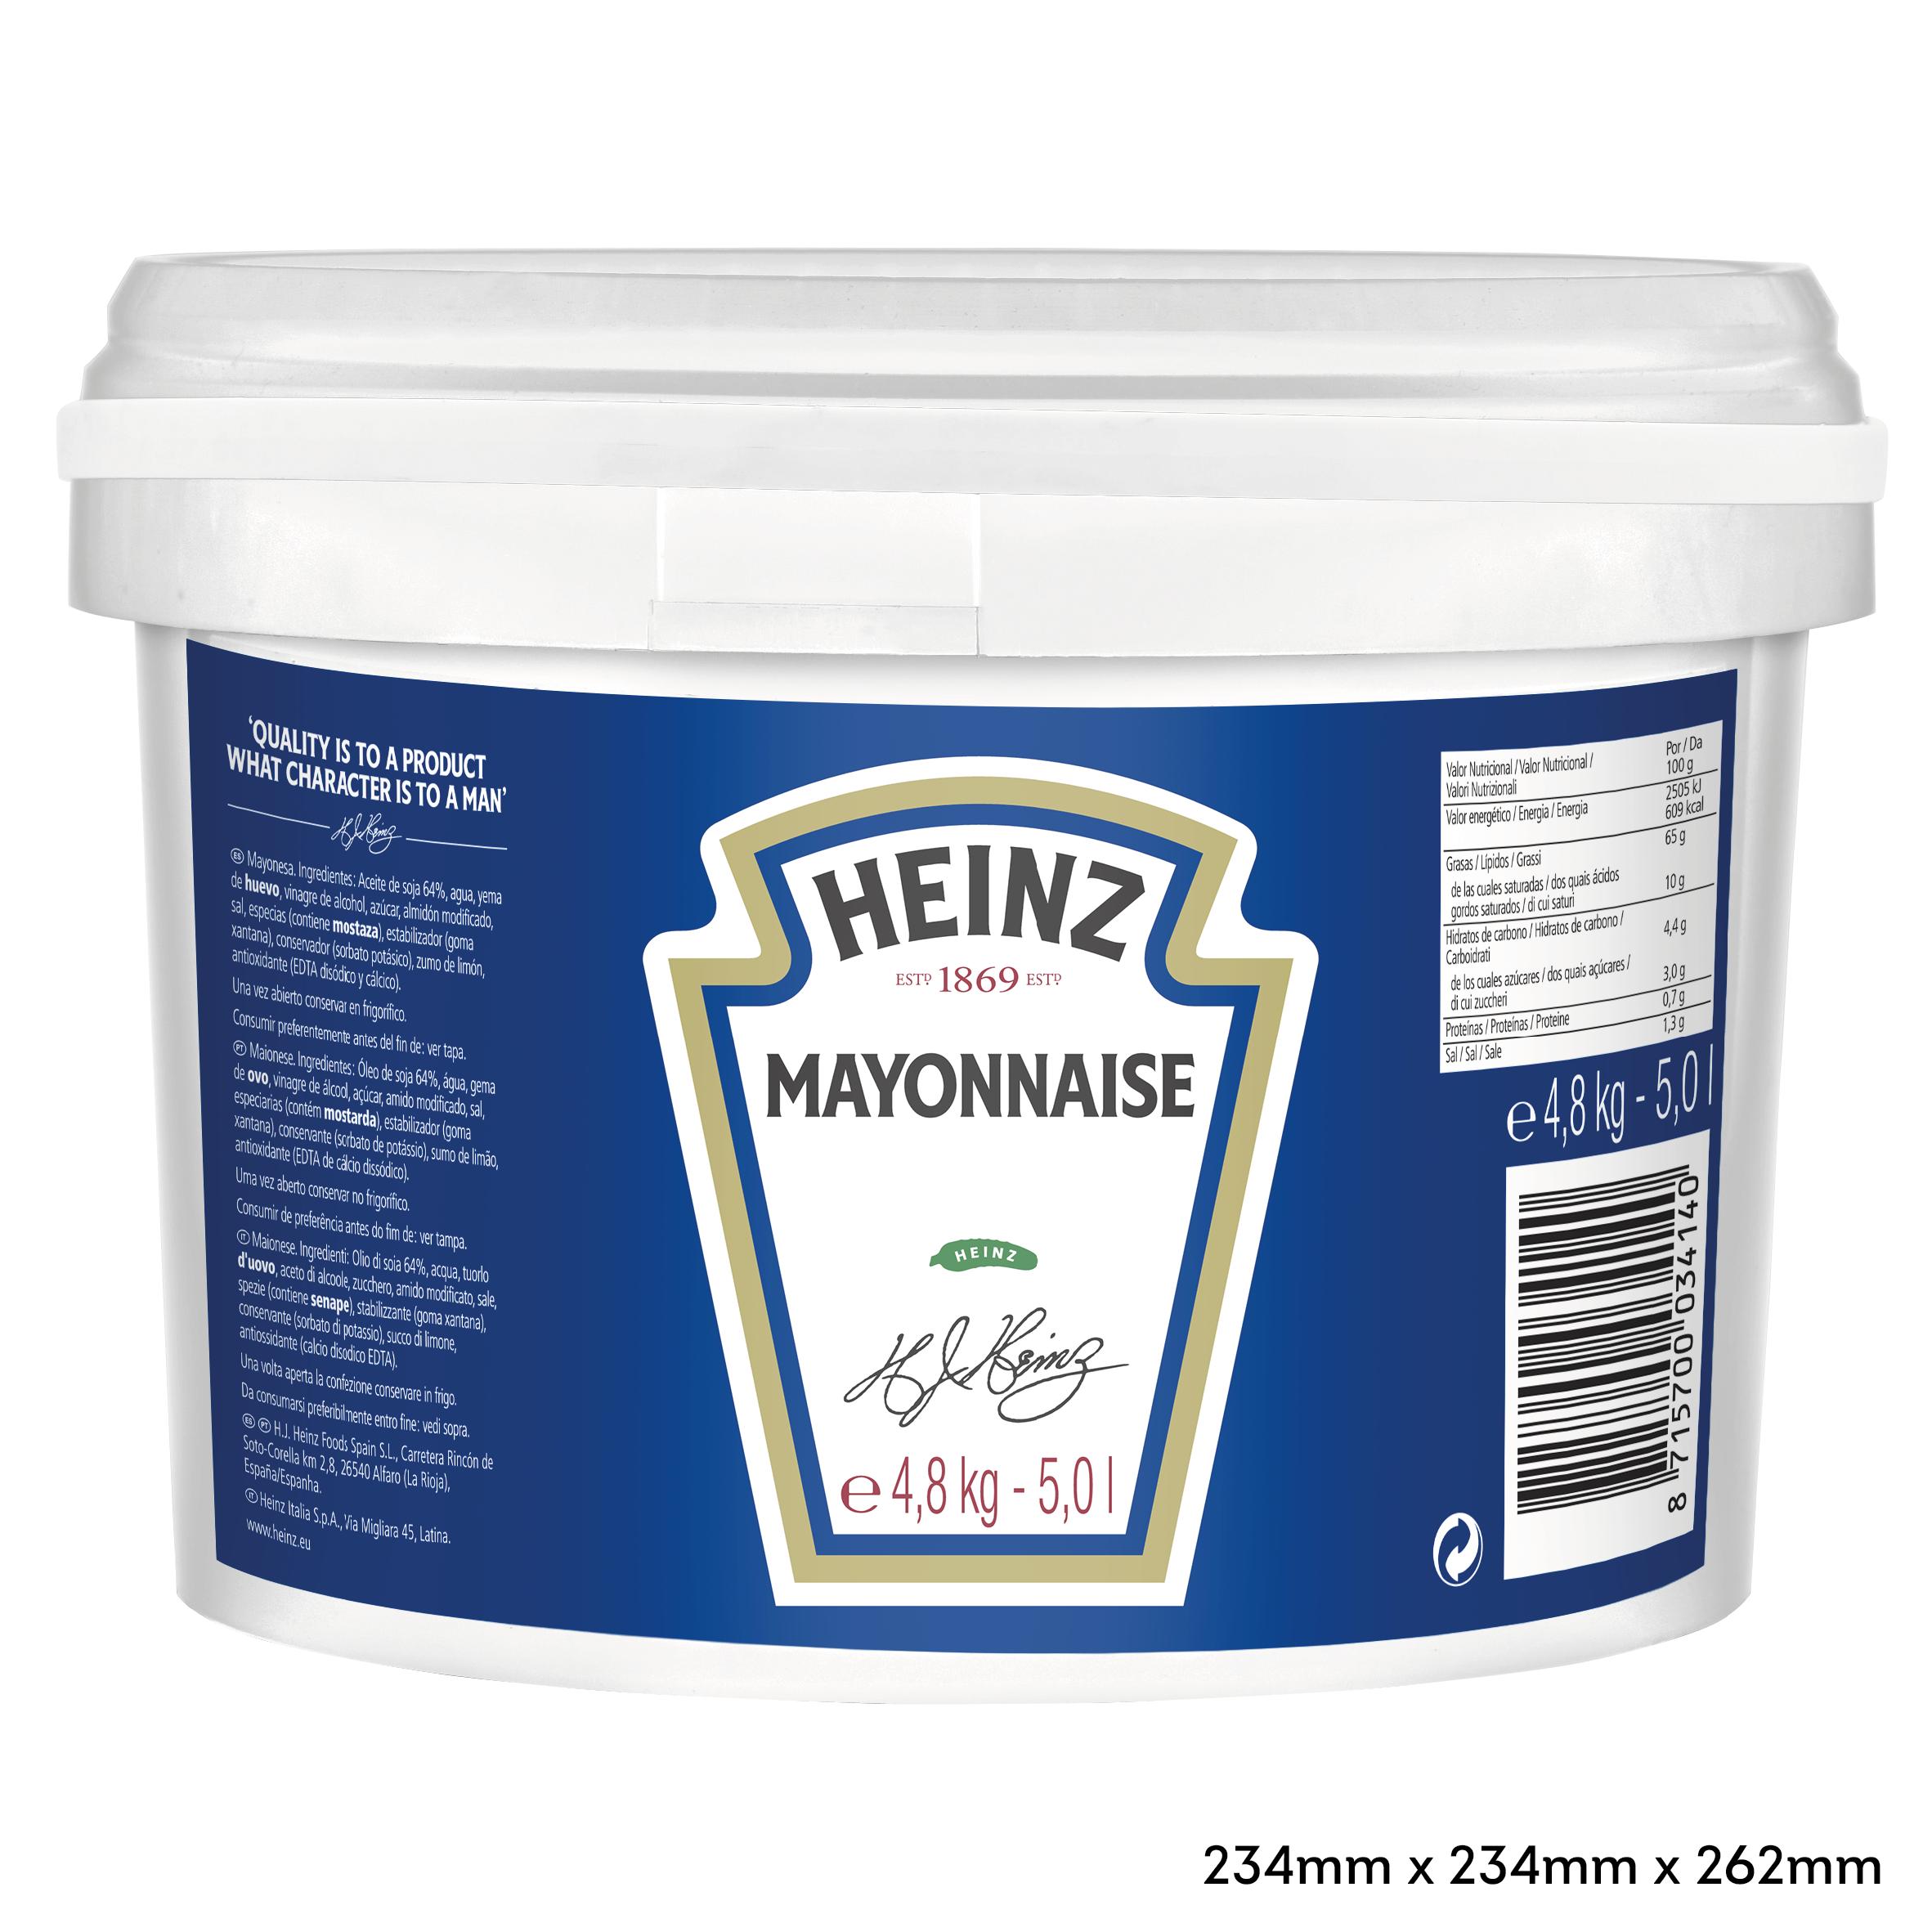 Heinz Mayonnaise 5L Pail